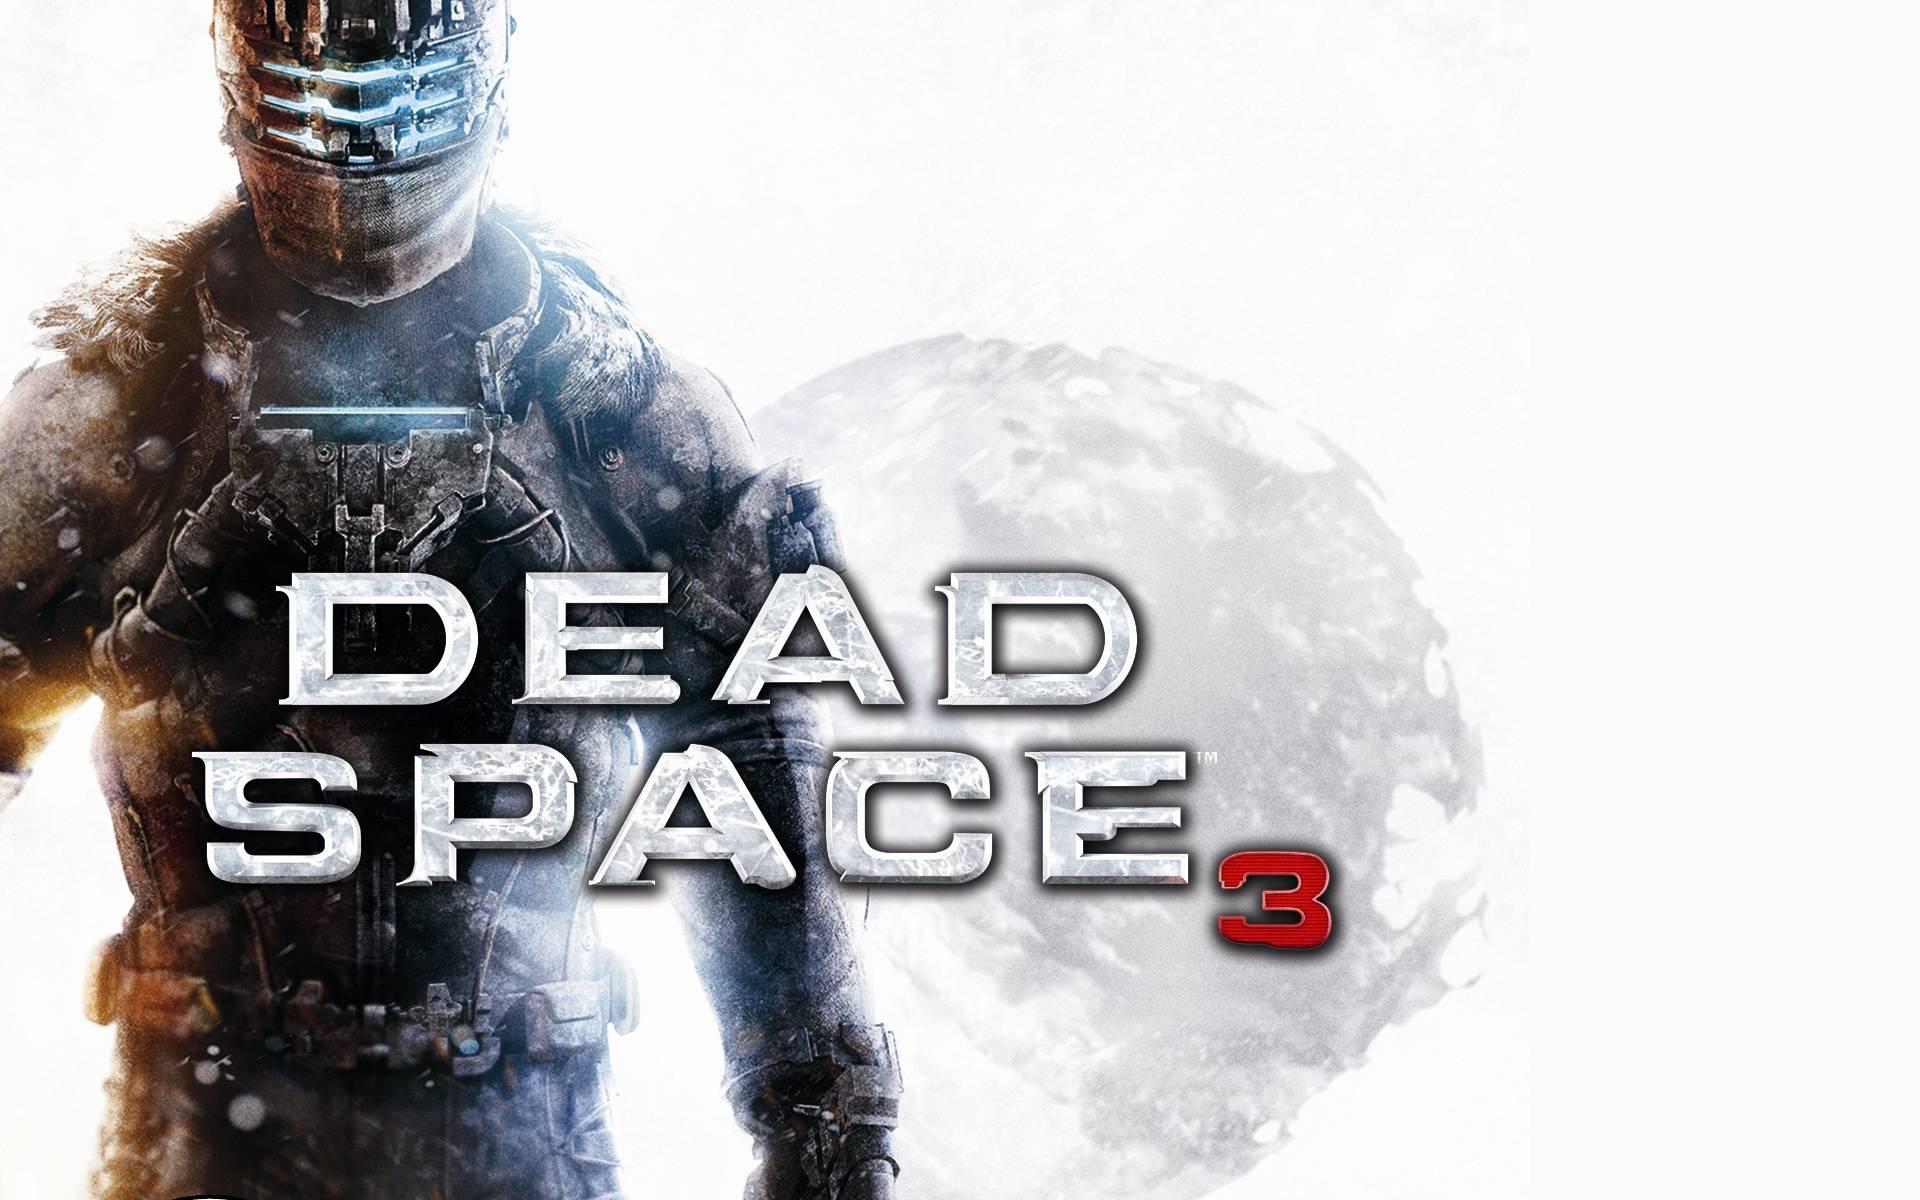 Awesome Dead Space 3 Wallpaper 29460 1920×1080 px ~ fond ecran